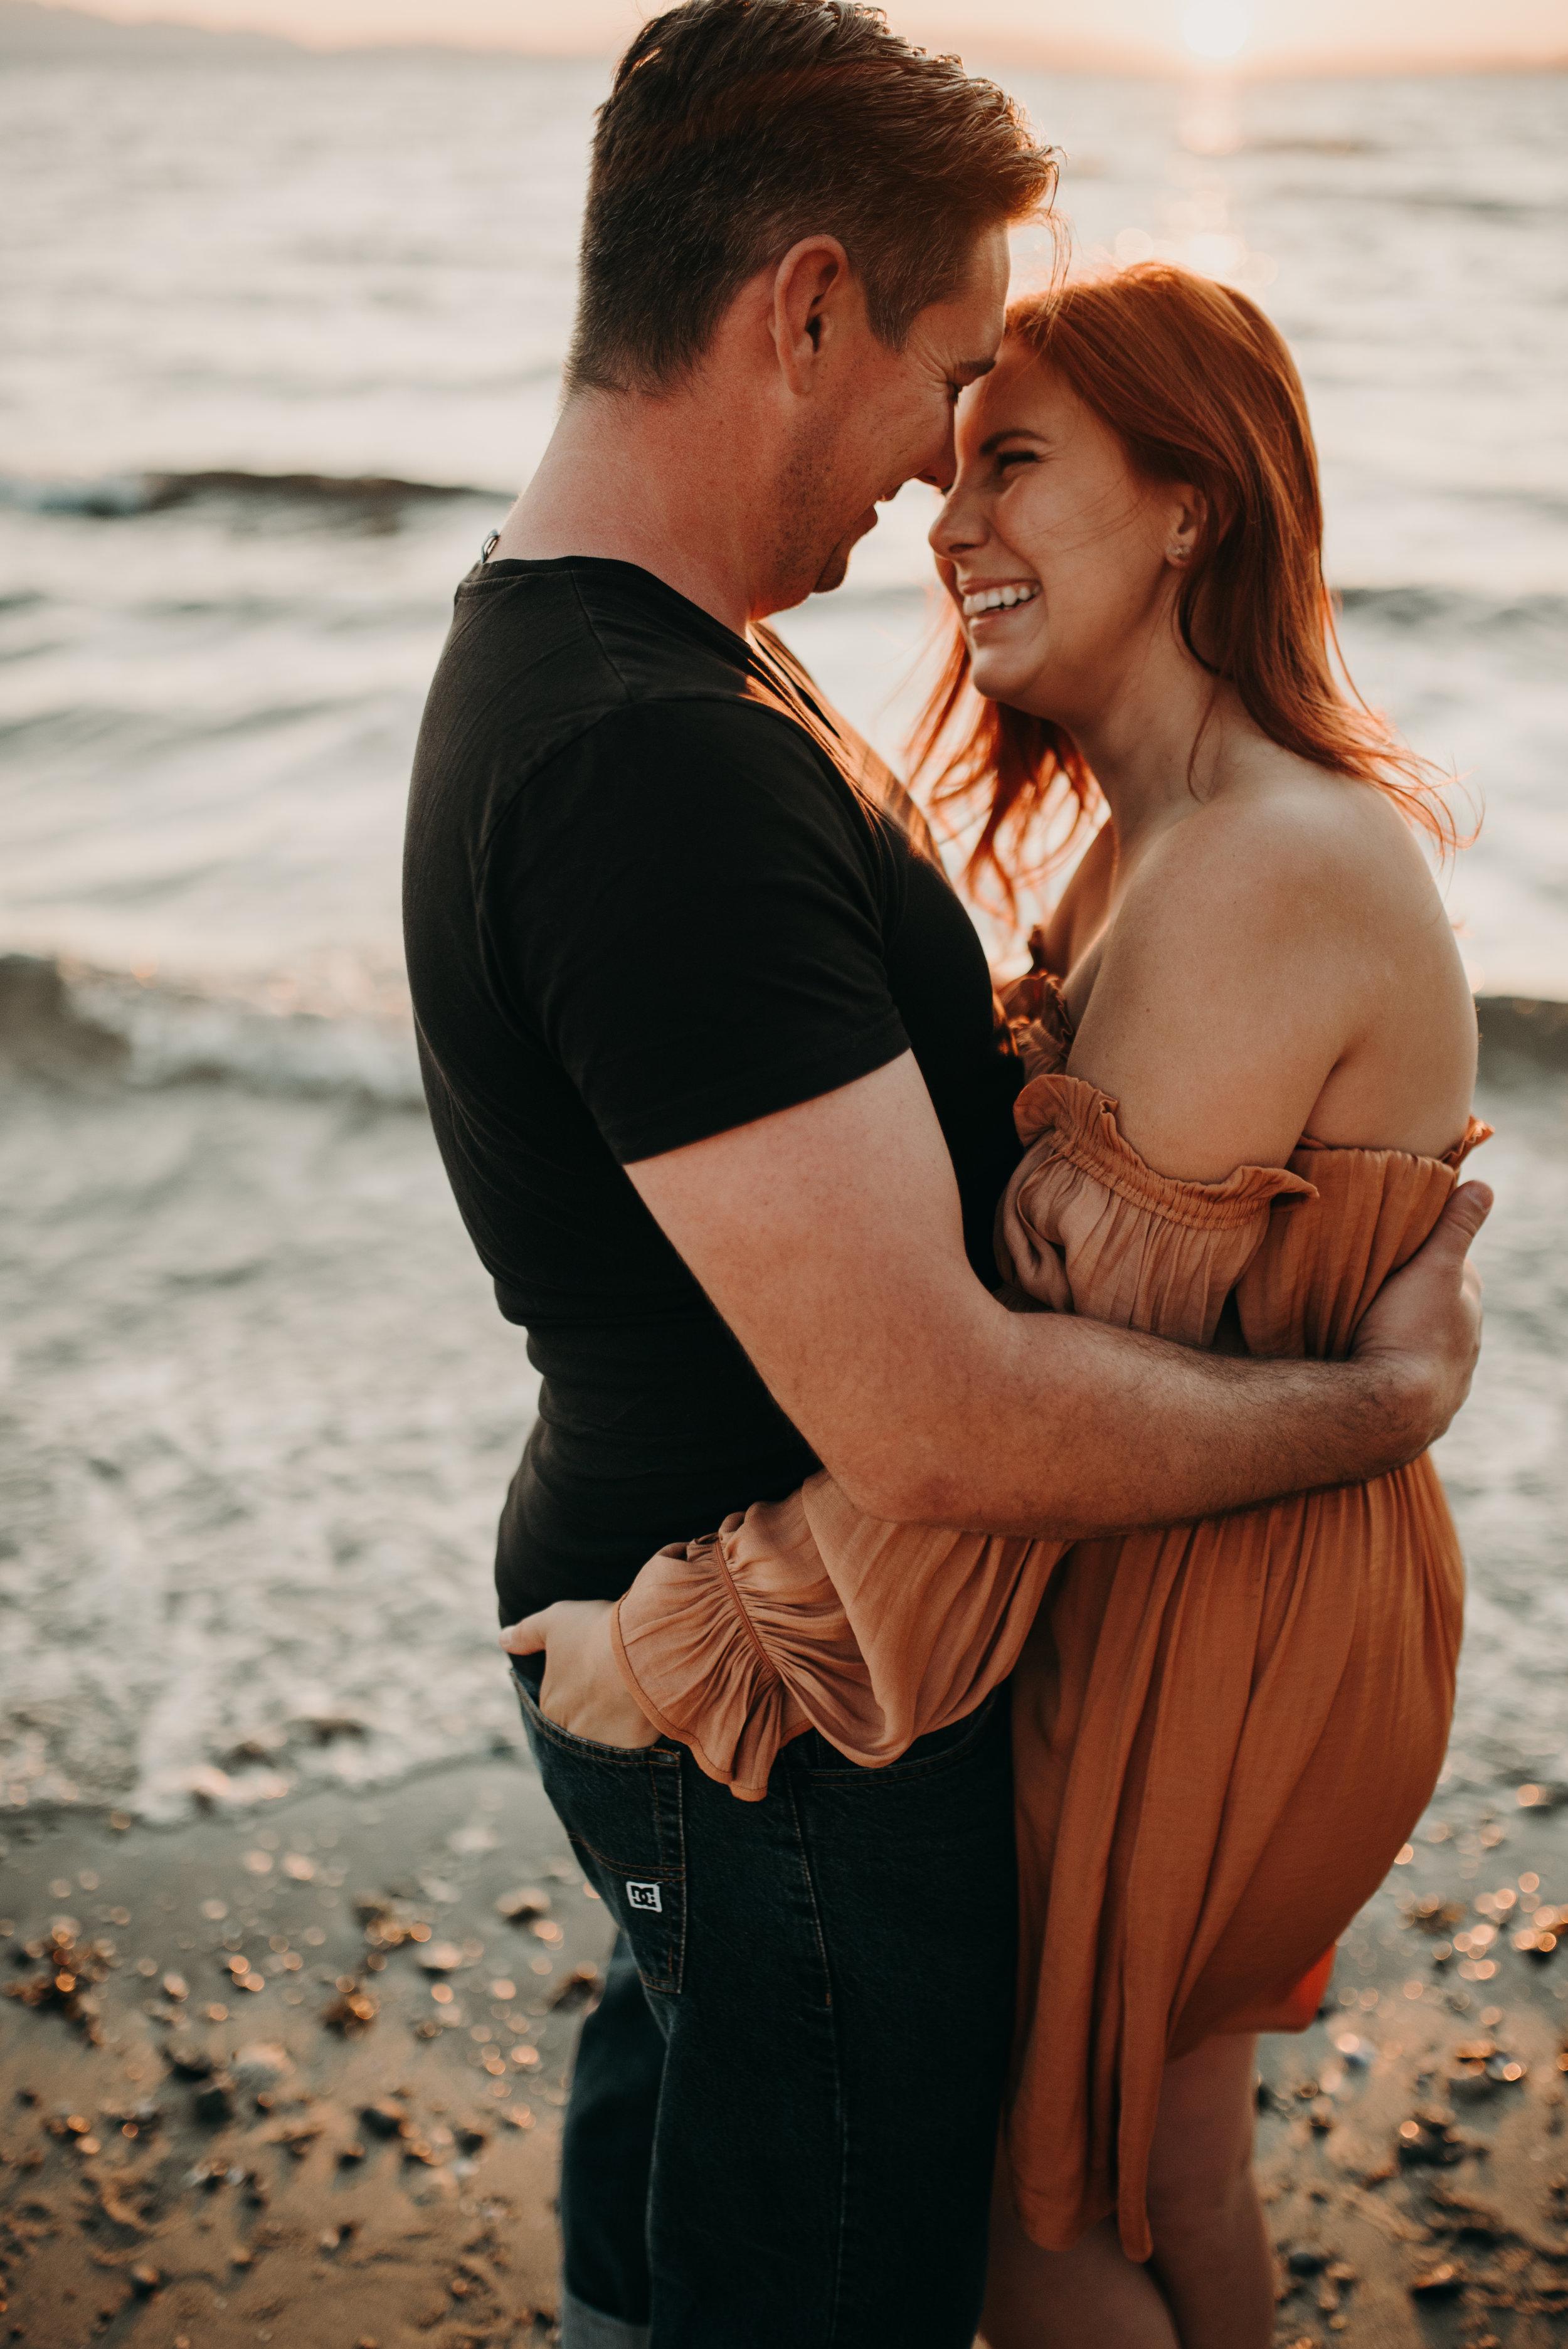 Kaylyn&SeanSeptember13,2017-LauraOlsonPhotography-SunshineCoastBCPhotographer-0798.jpg